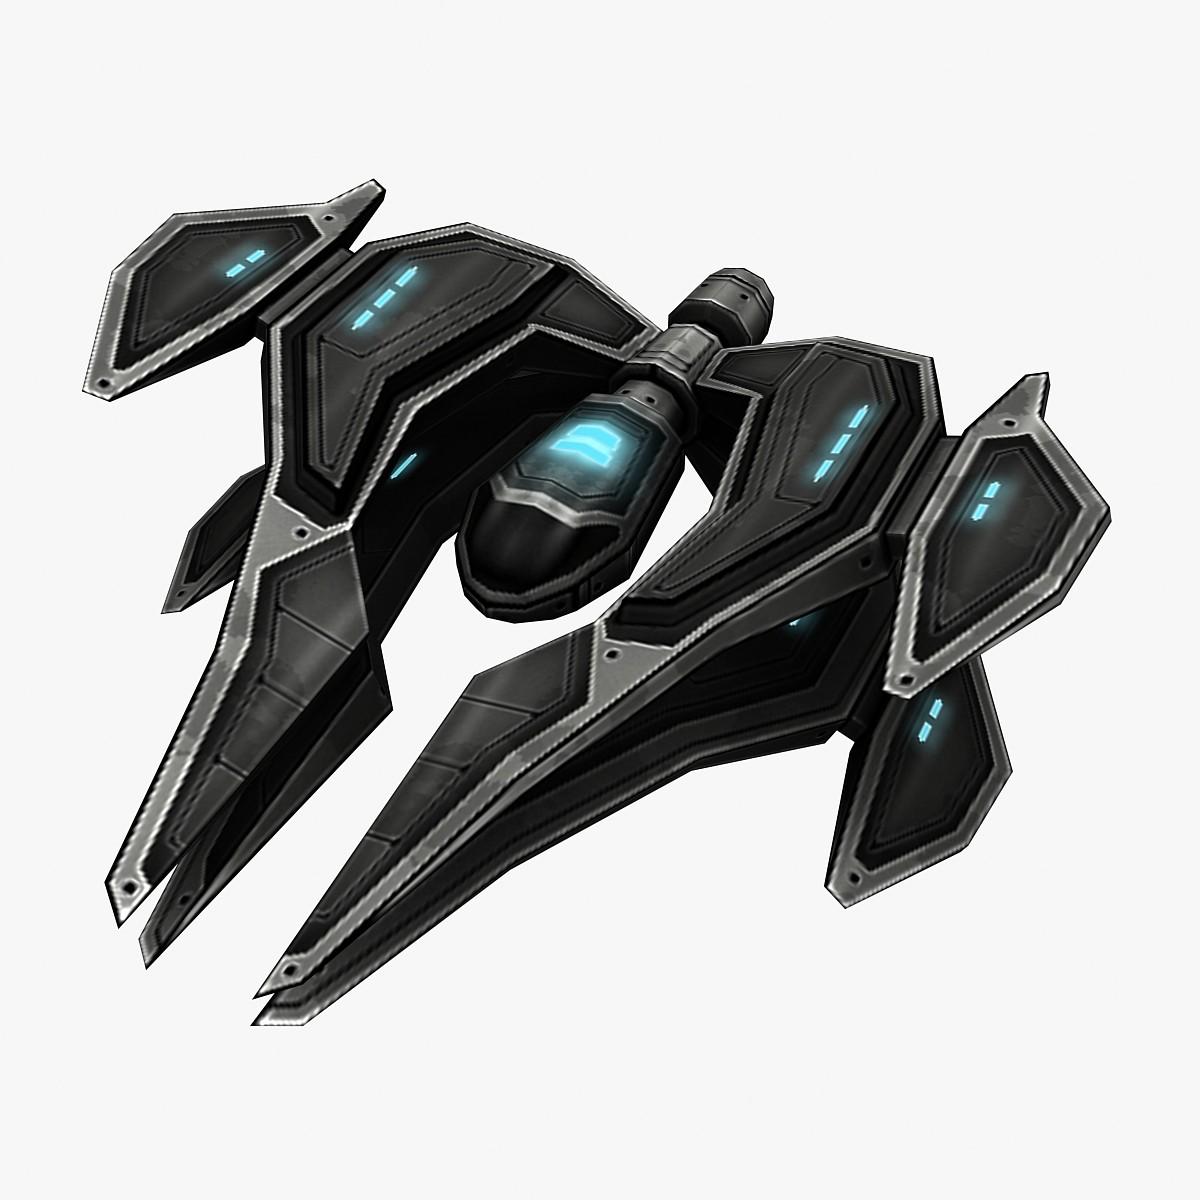 3ds max ship 5